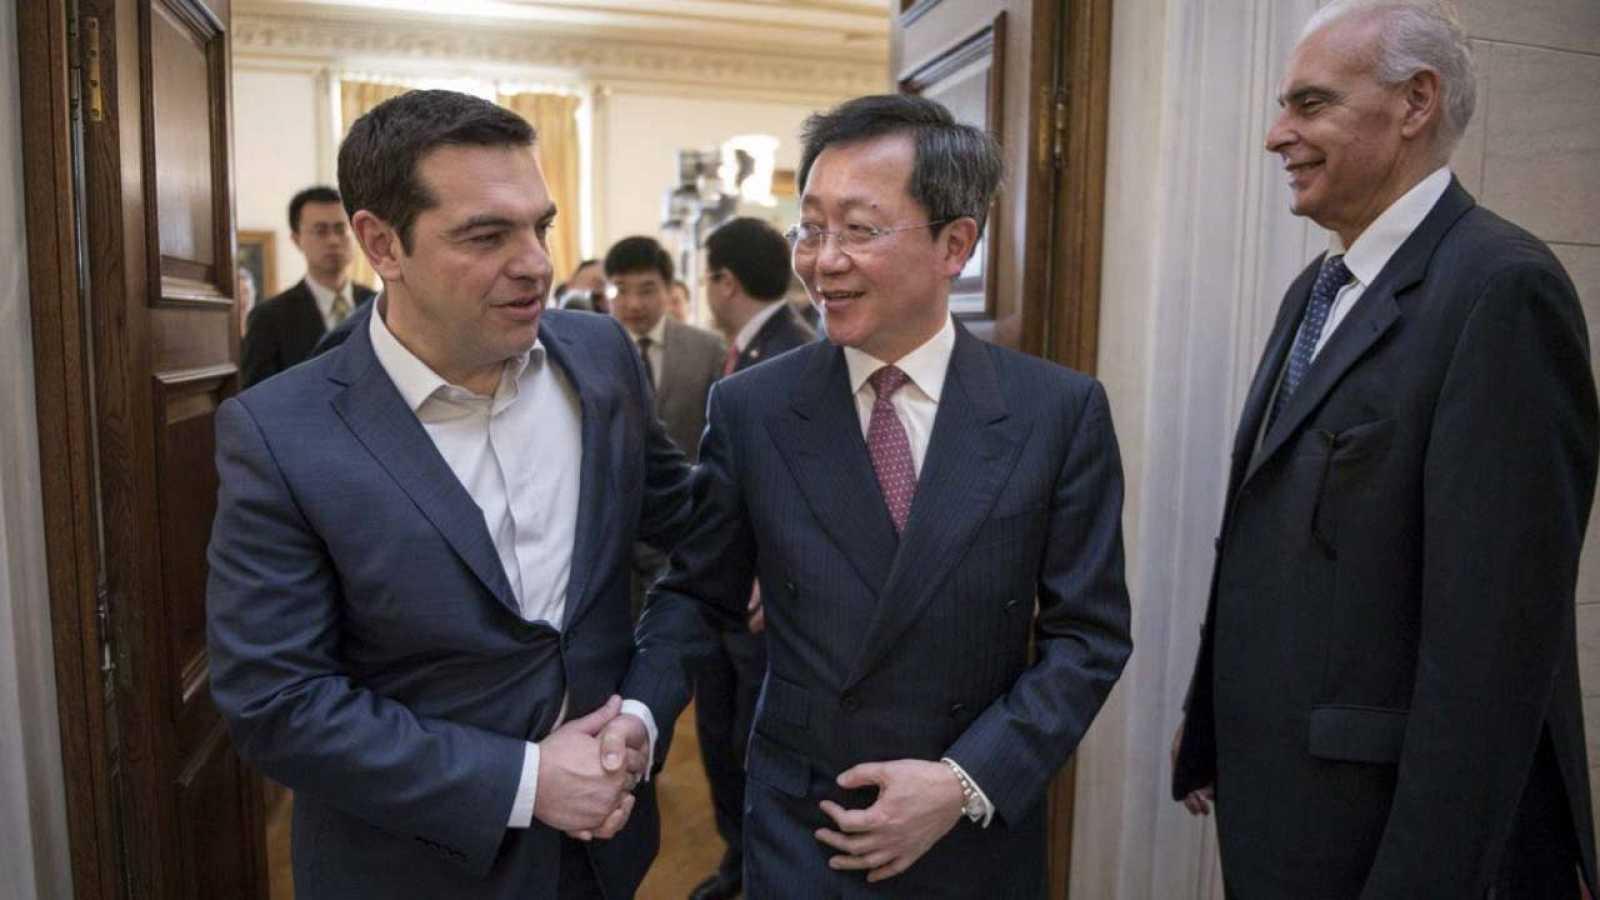 El primer ministro griego, Alexis Tsipras, recibe al presidente de COSCO, Xu Lirong, en su residencia oficial en Atenas